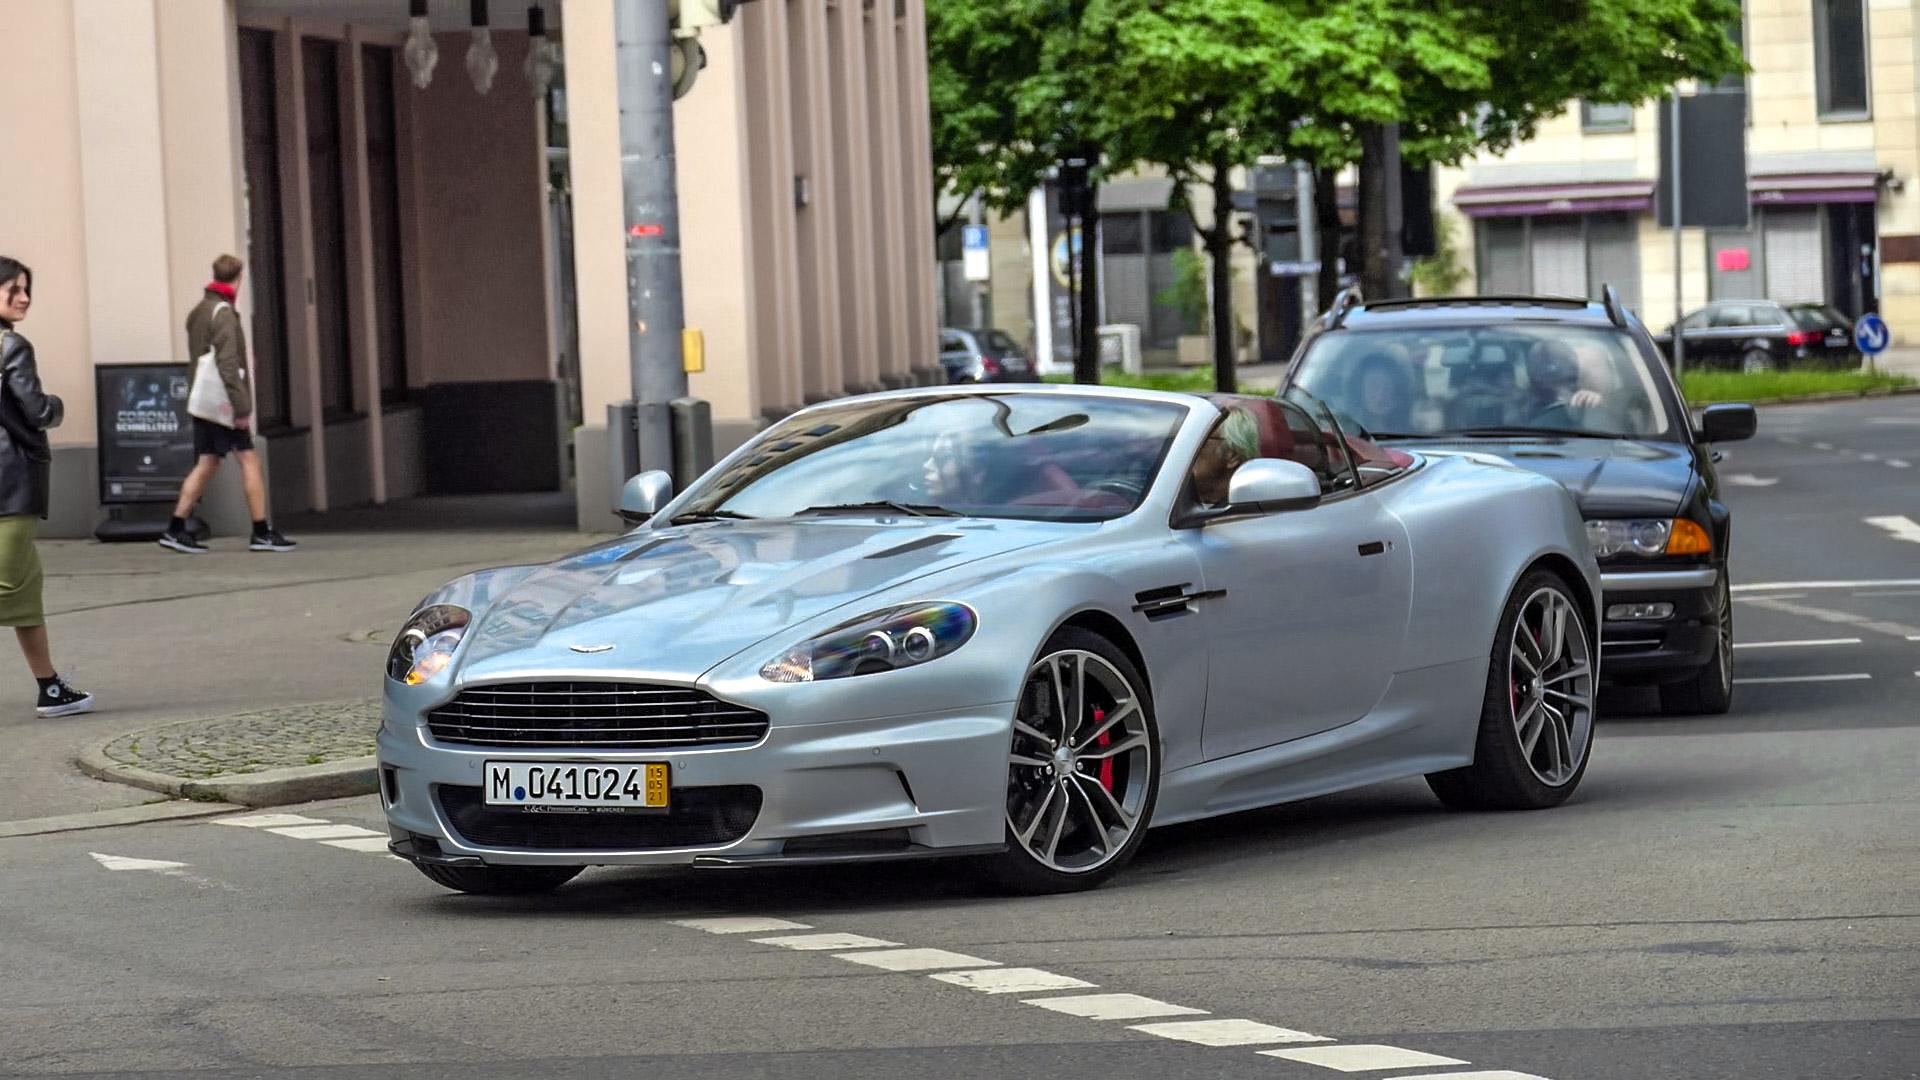 Aston Martin DBS Volante - M-041024